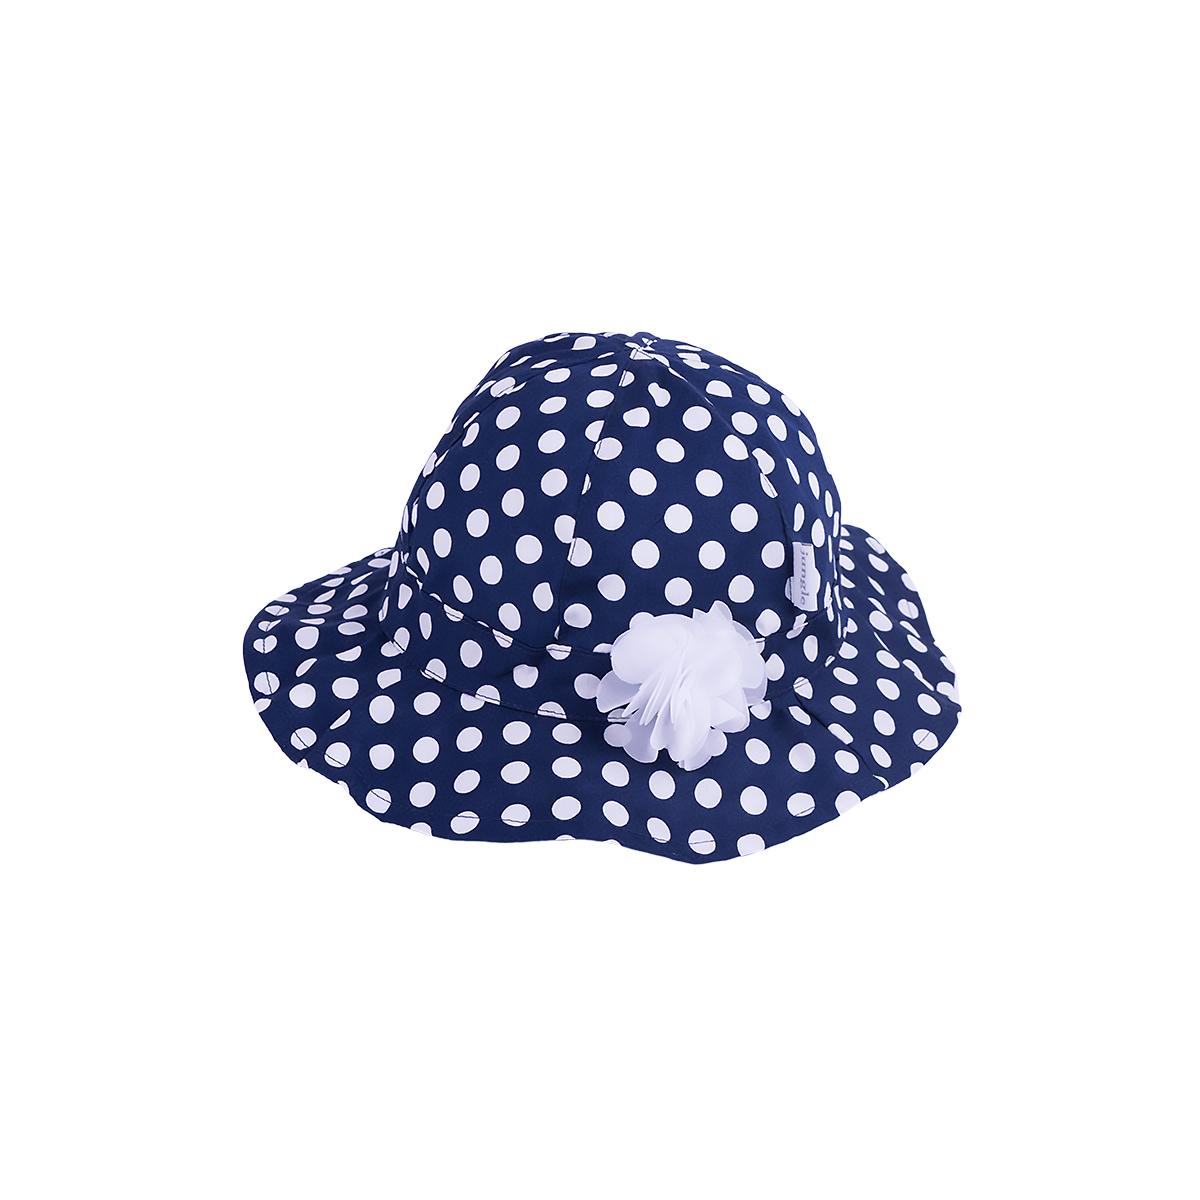 Jungle šešir S19-09, 50-56